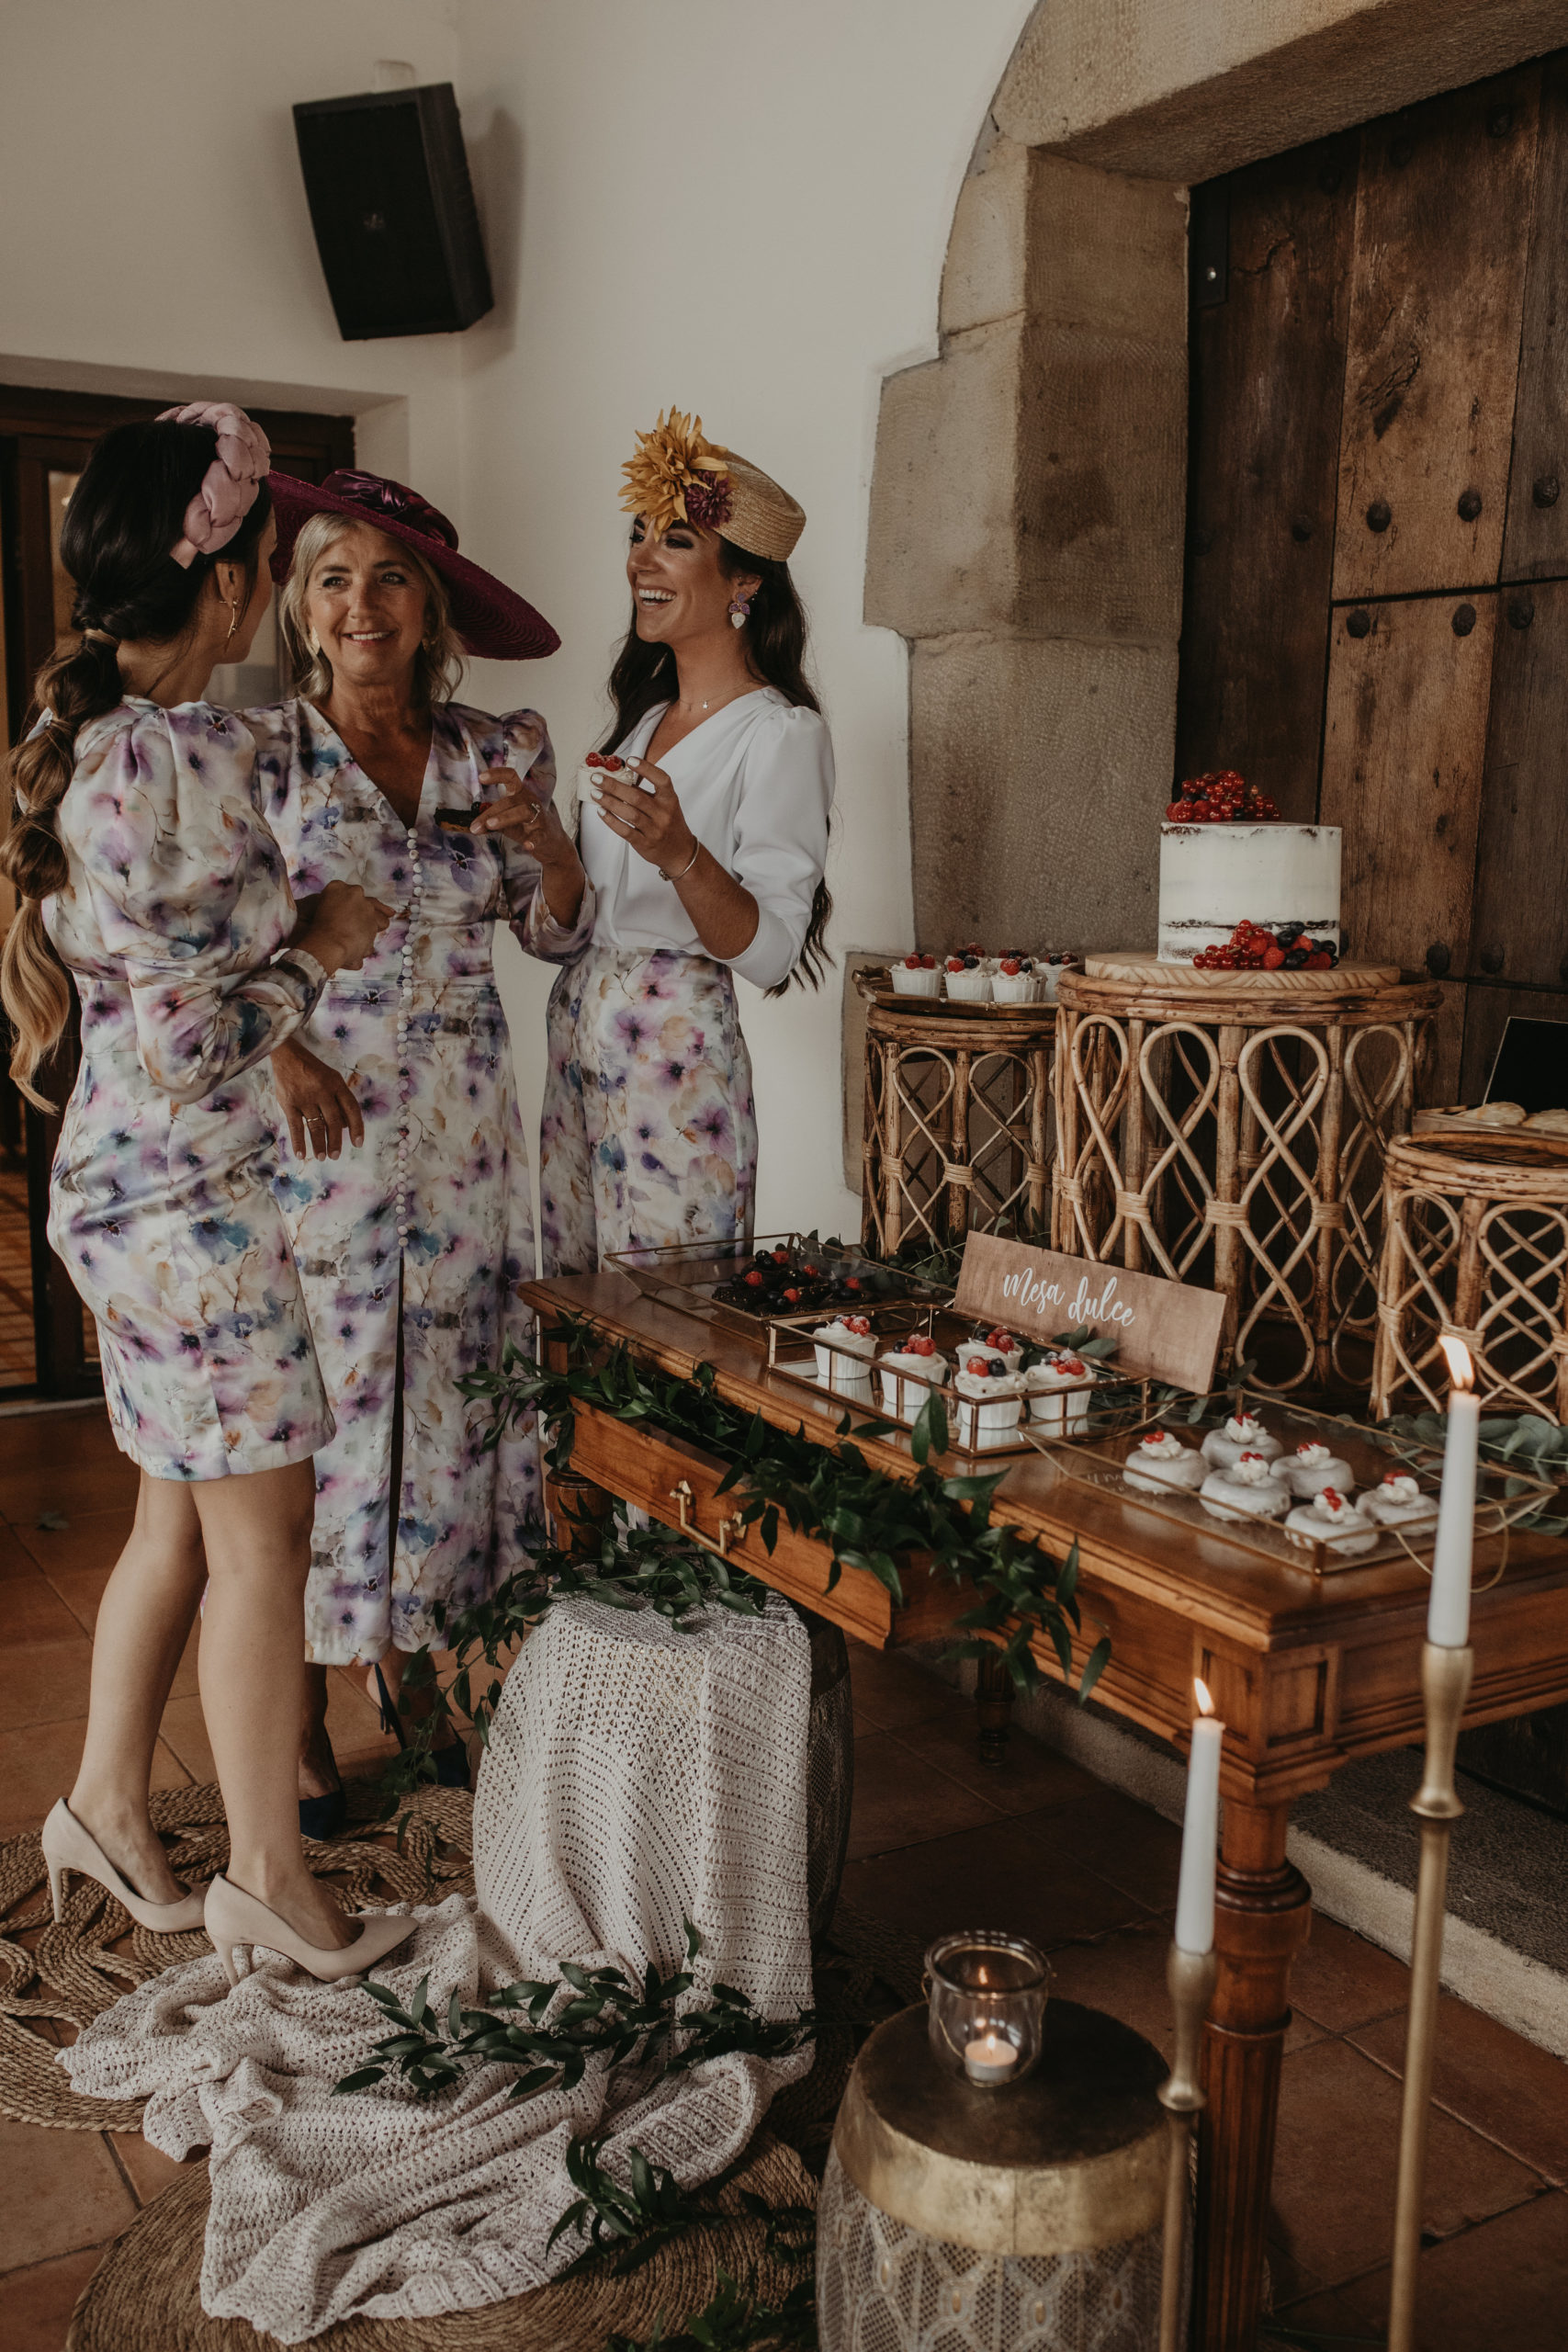 Invitadas de boda comiendo pasteles en un rincón dulce